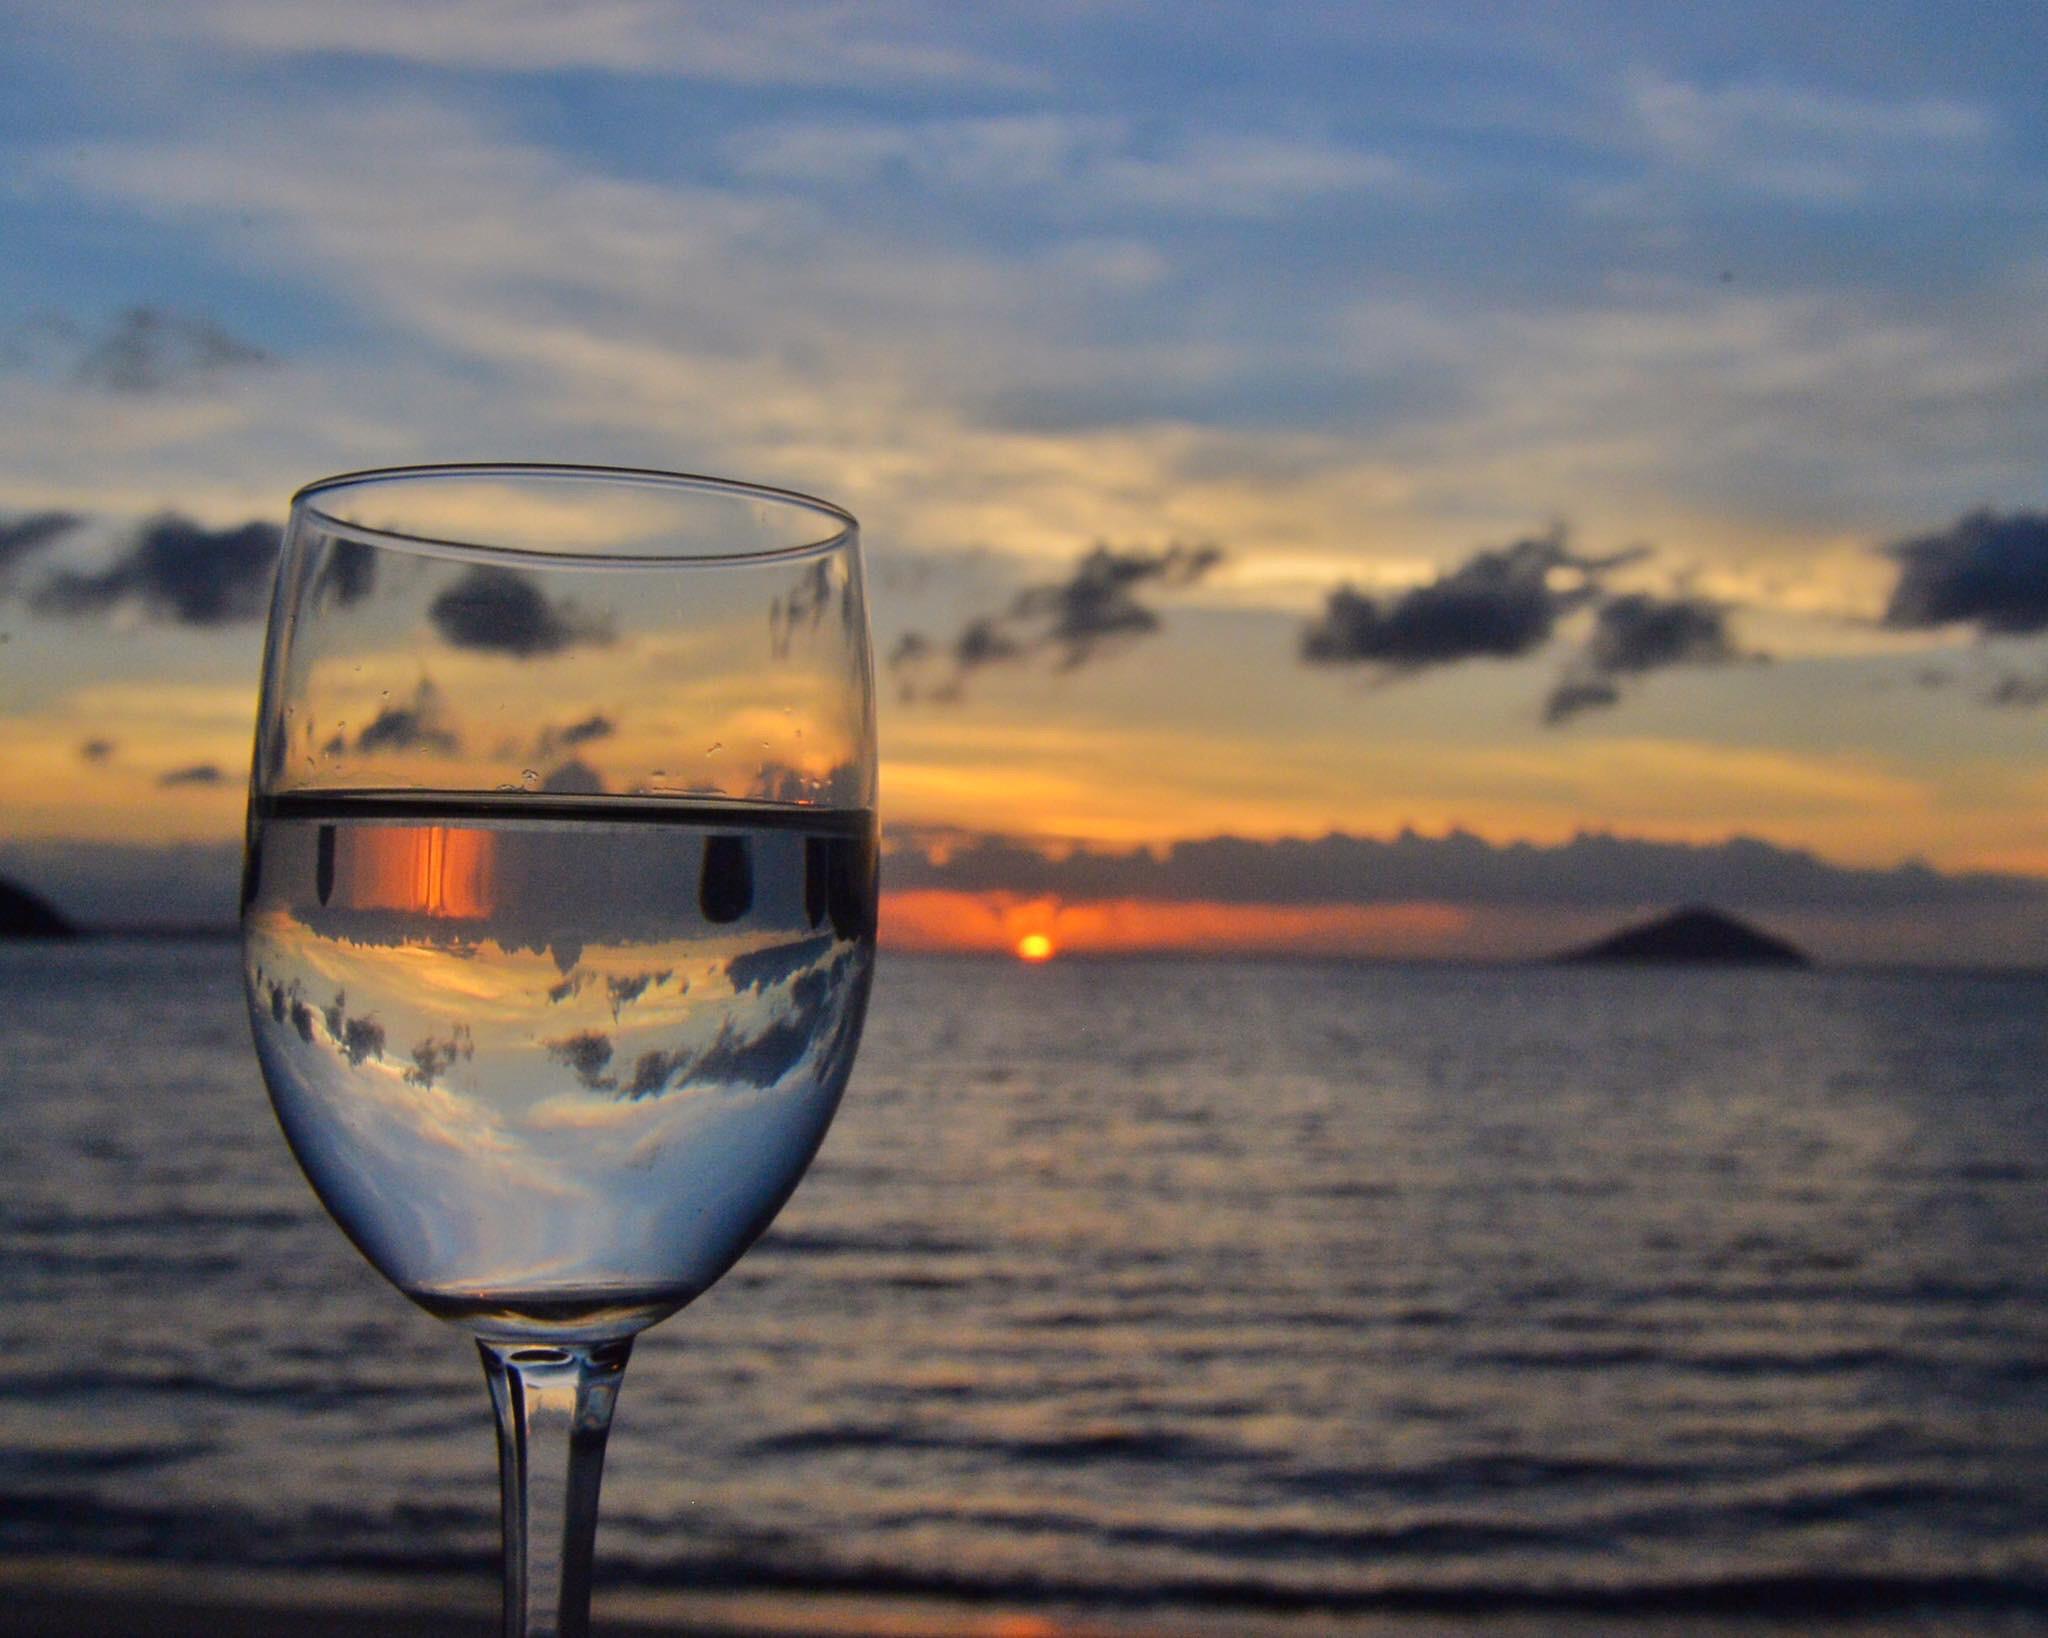 duangjan's sunset